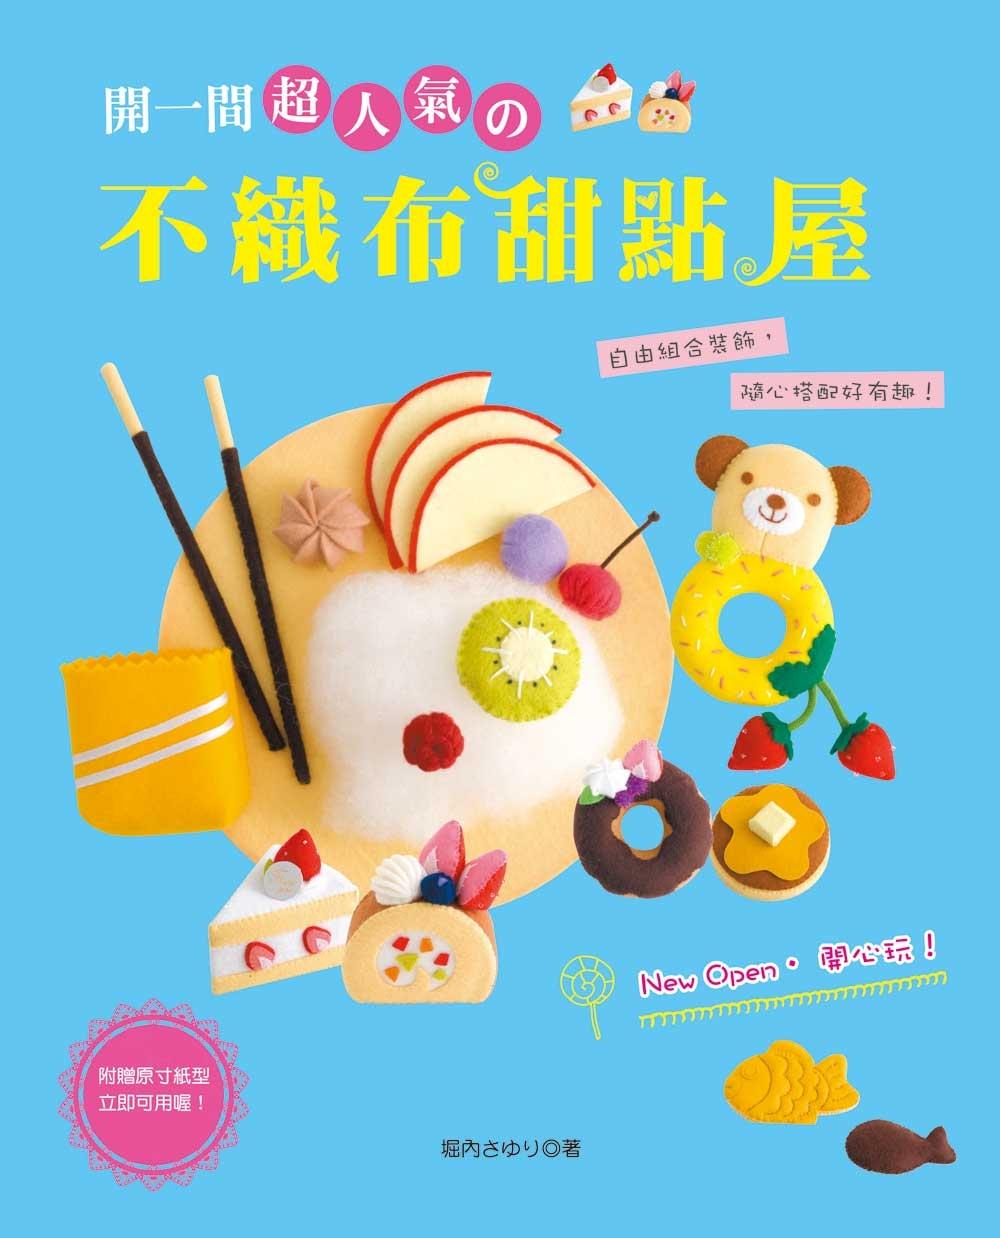 New Open‧開心玩^!:開一間超 の不織布甜點屋